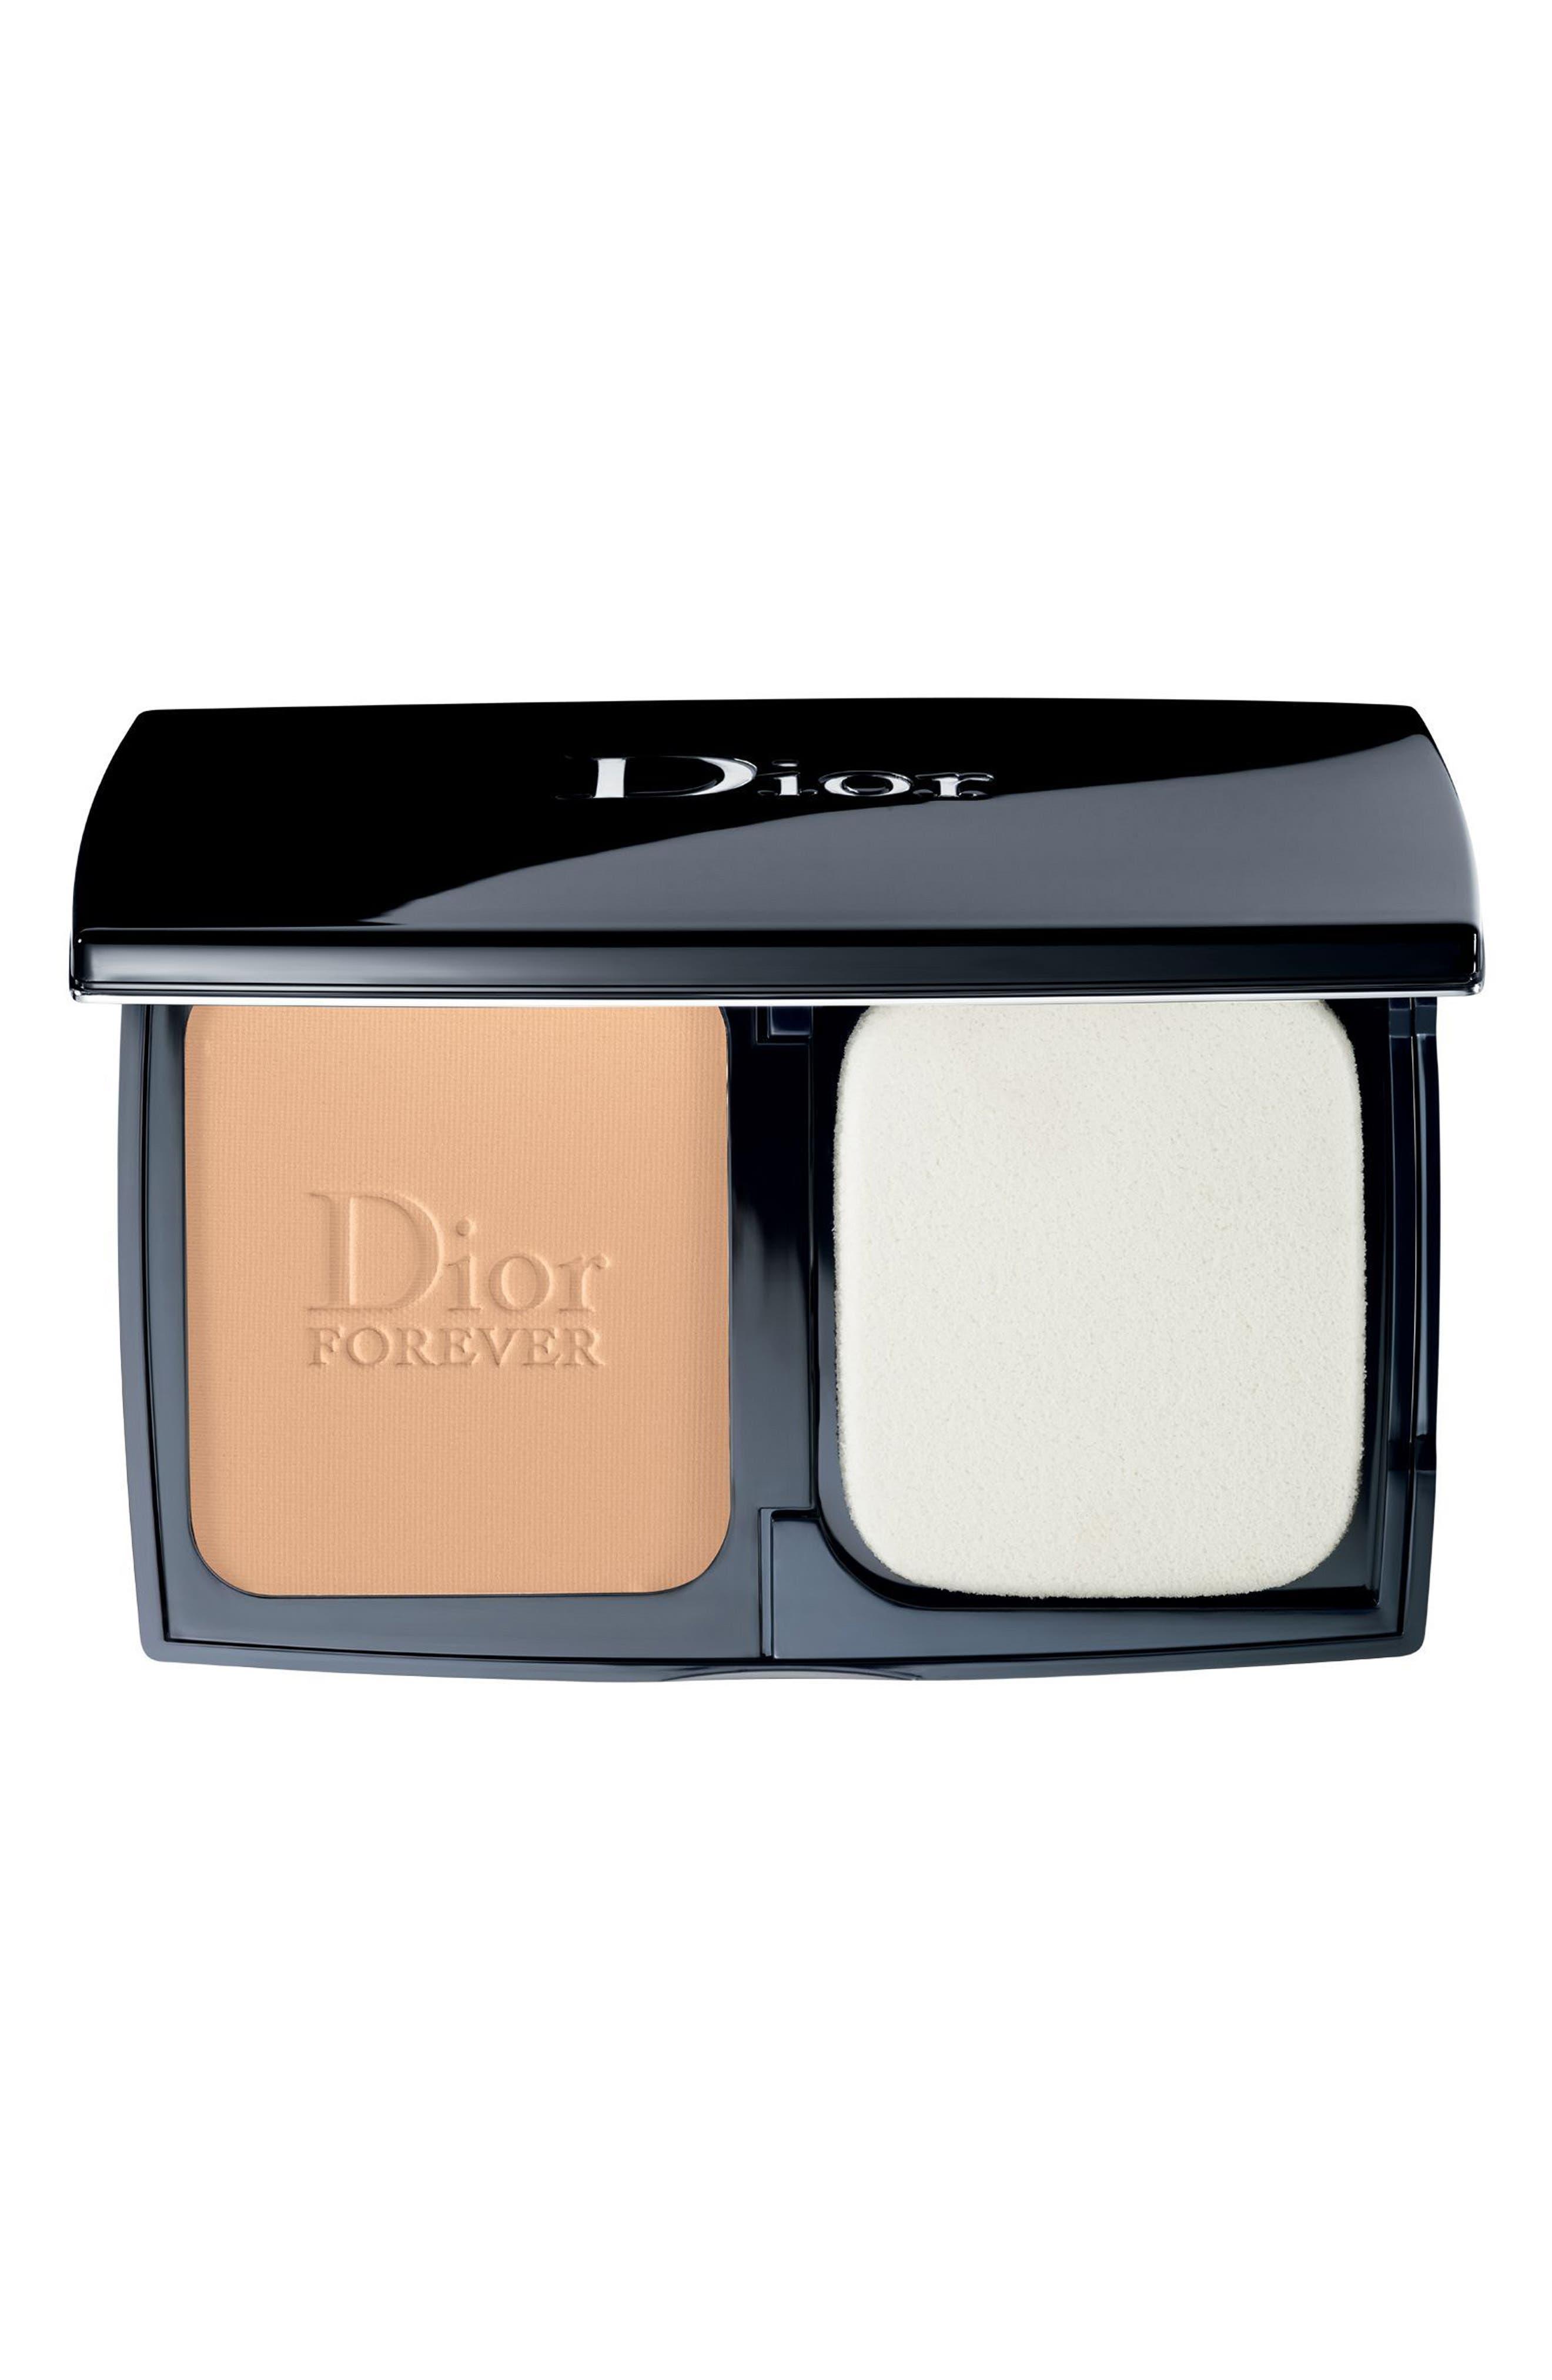 Dior Diorskin Forever Extreme Control - 020 Light Beige